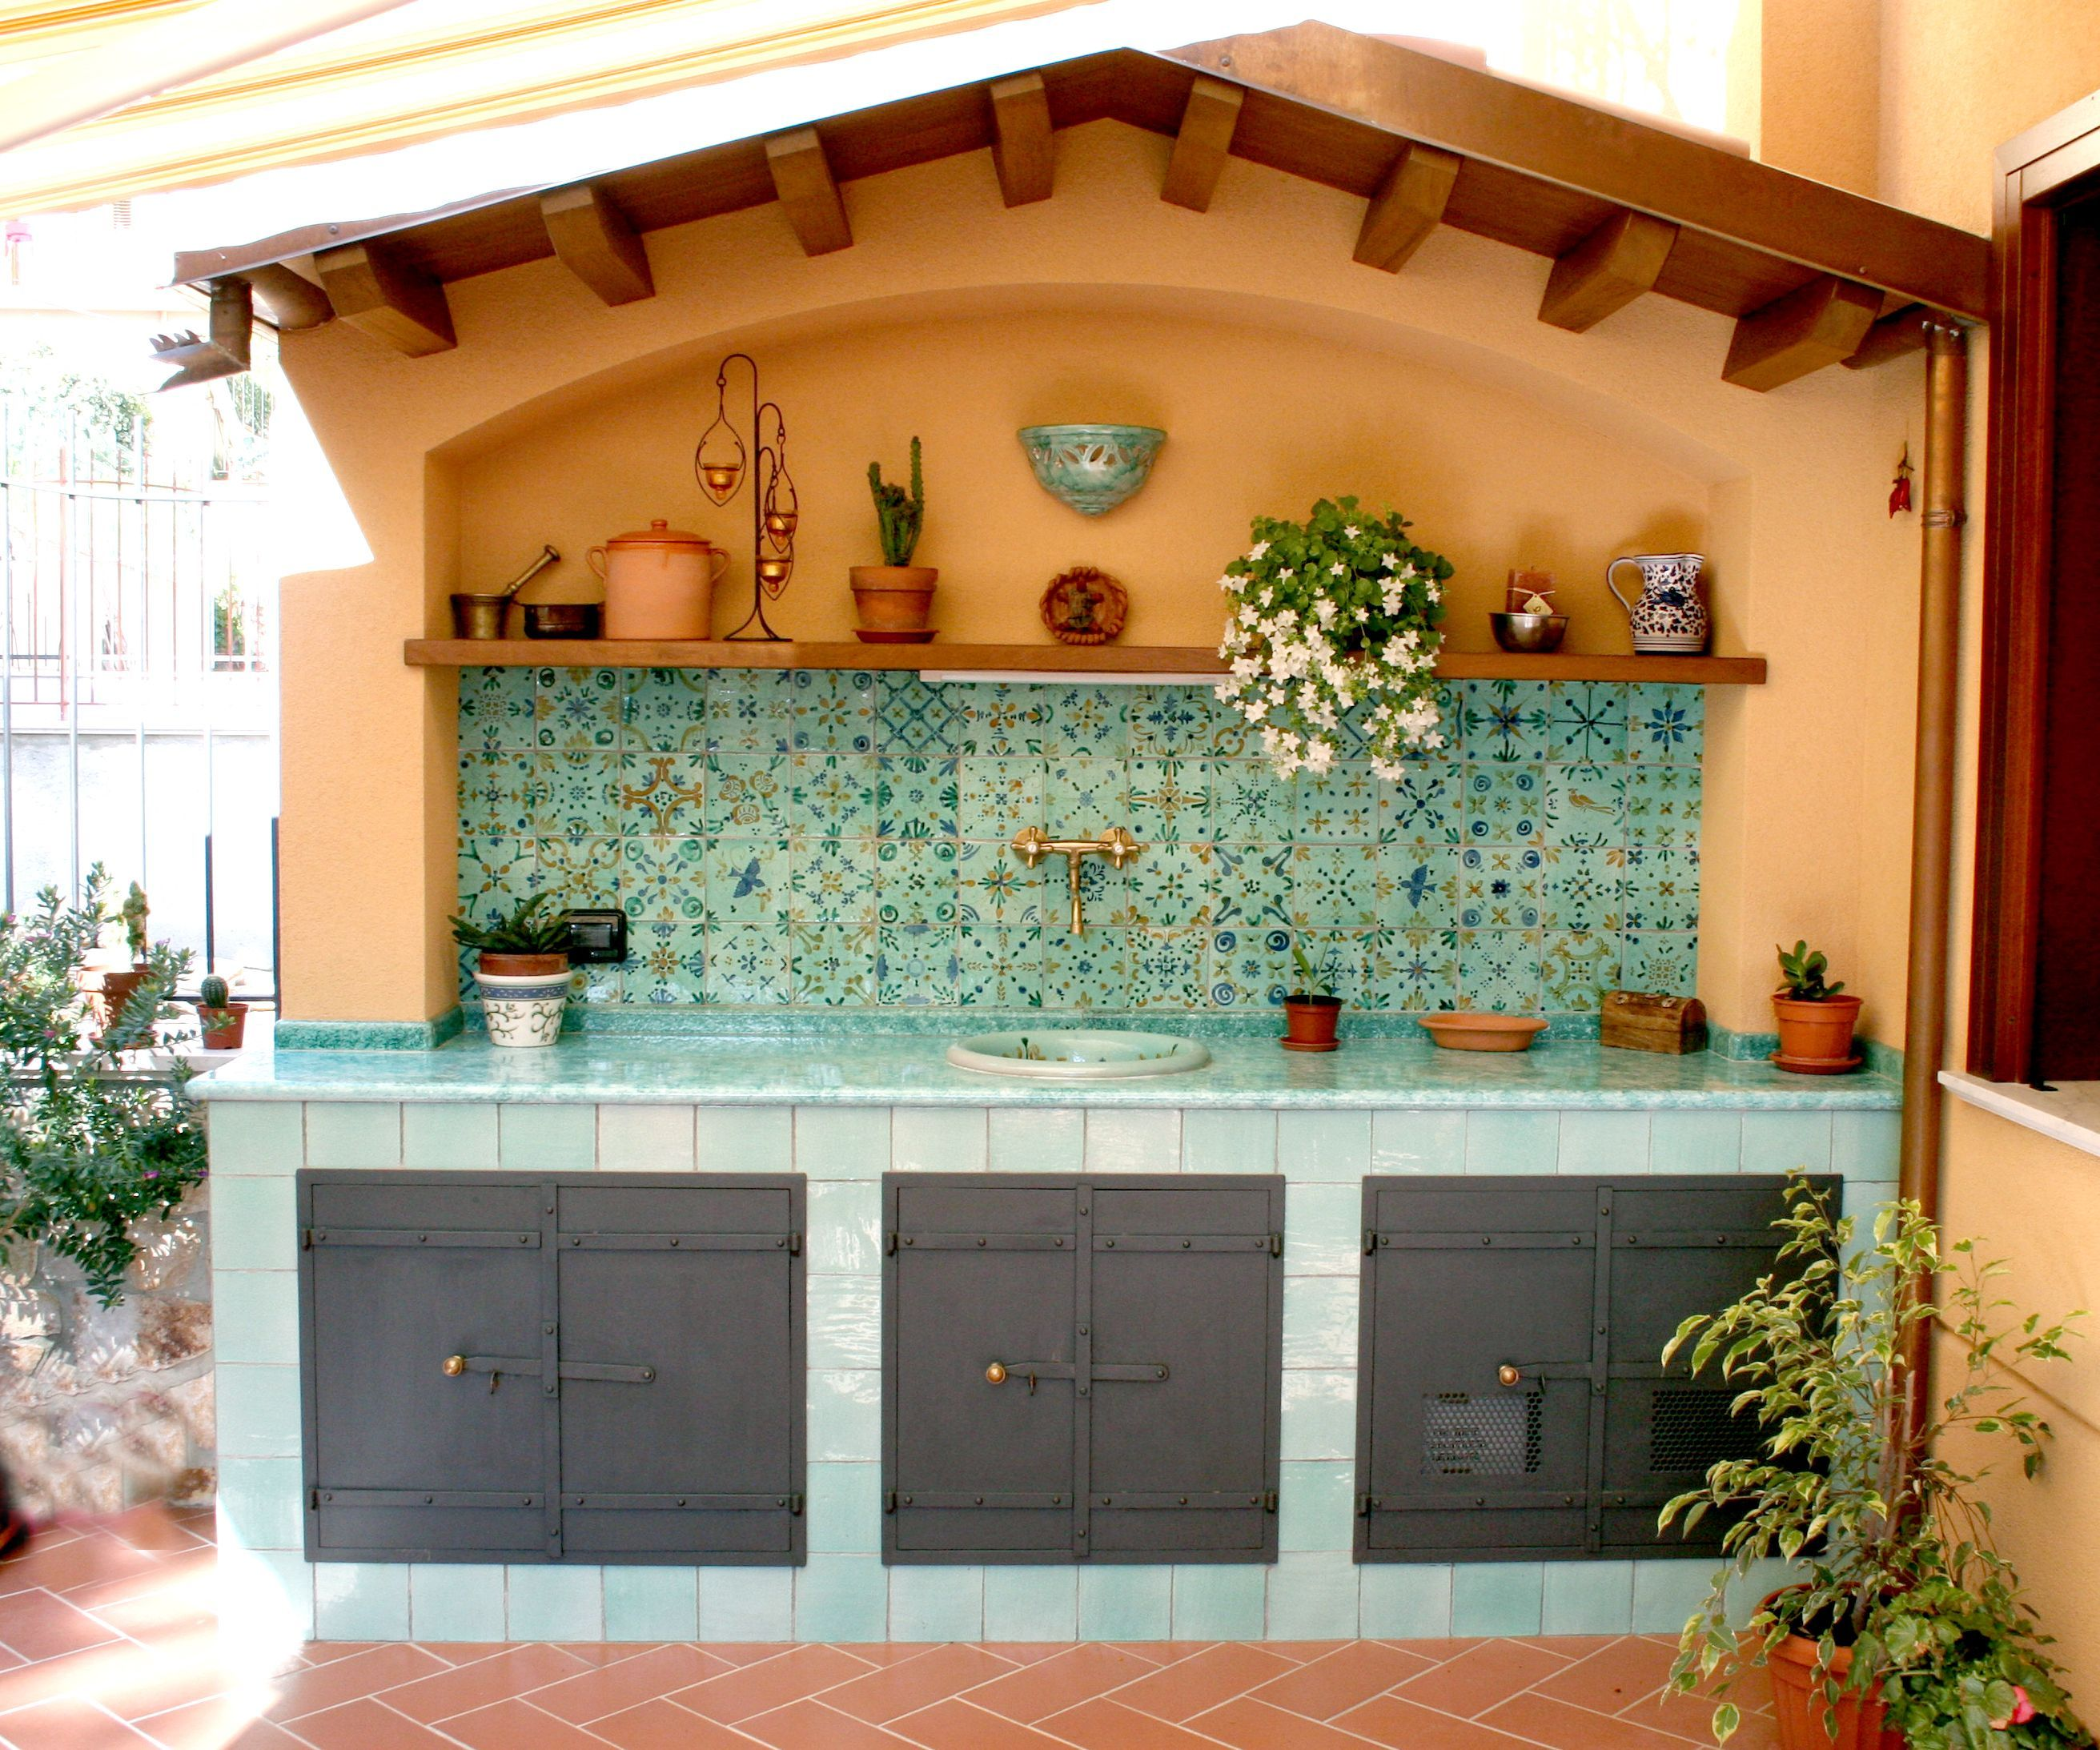 19 1 elképesztő szabadtéri konyha konyhasziget patio kitchen outdoor kitchen interior on outdoor kitchen ytong id=40571